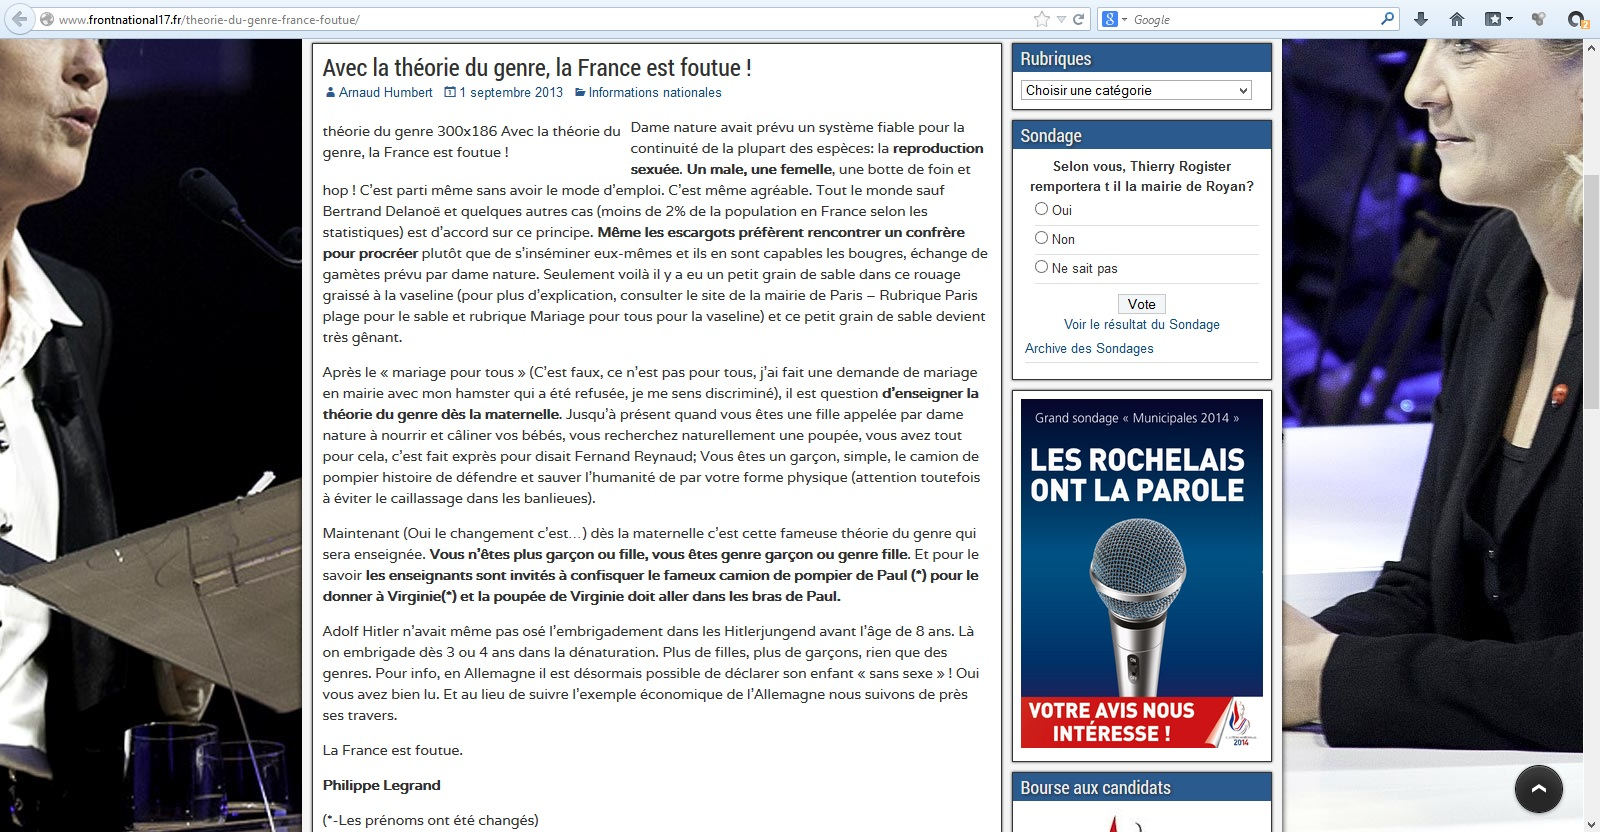 FN_Theorie_du_genre-Charente-Maritime